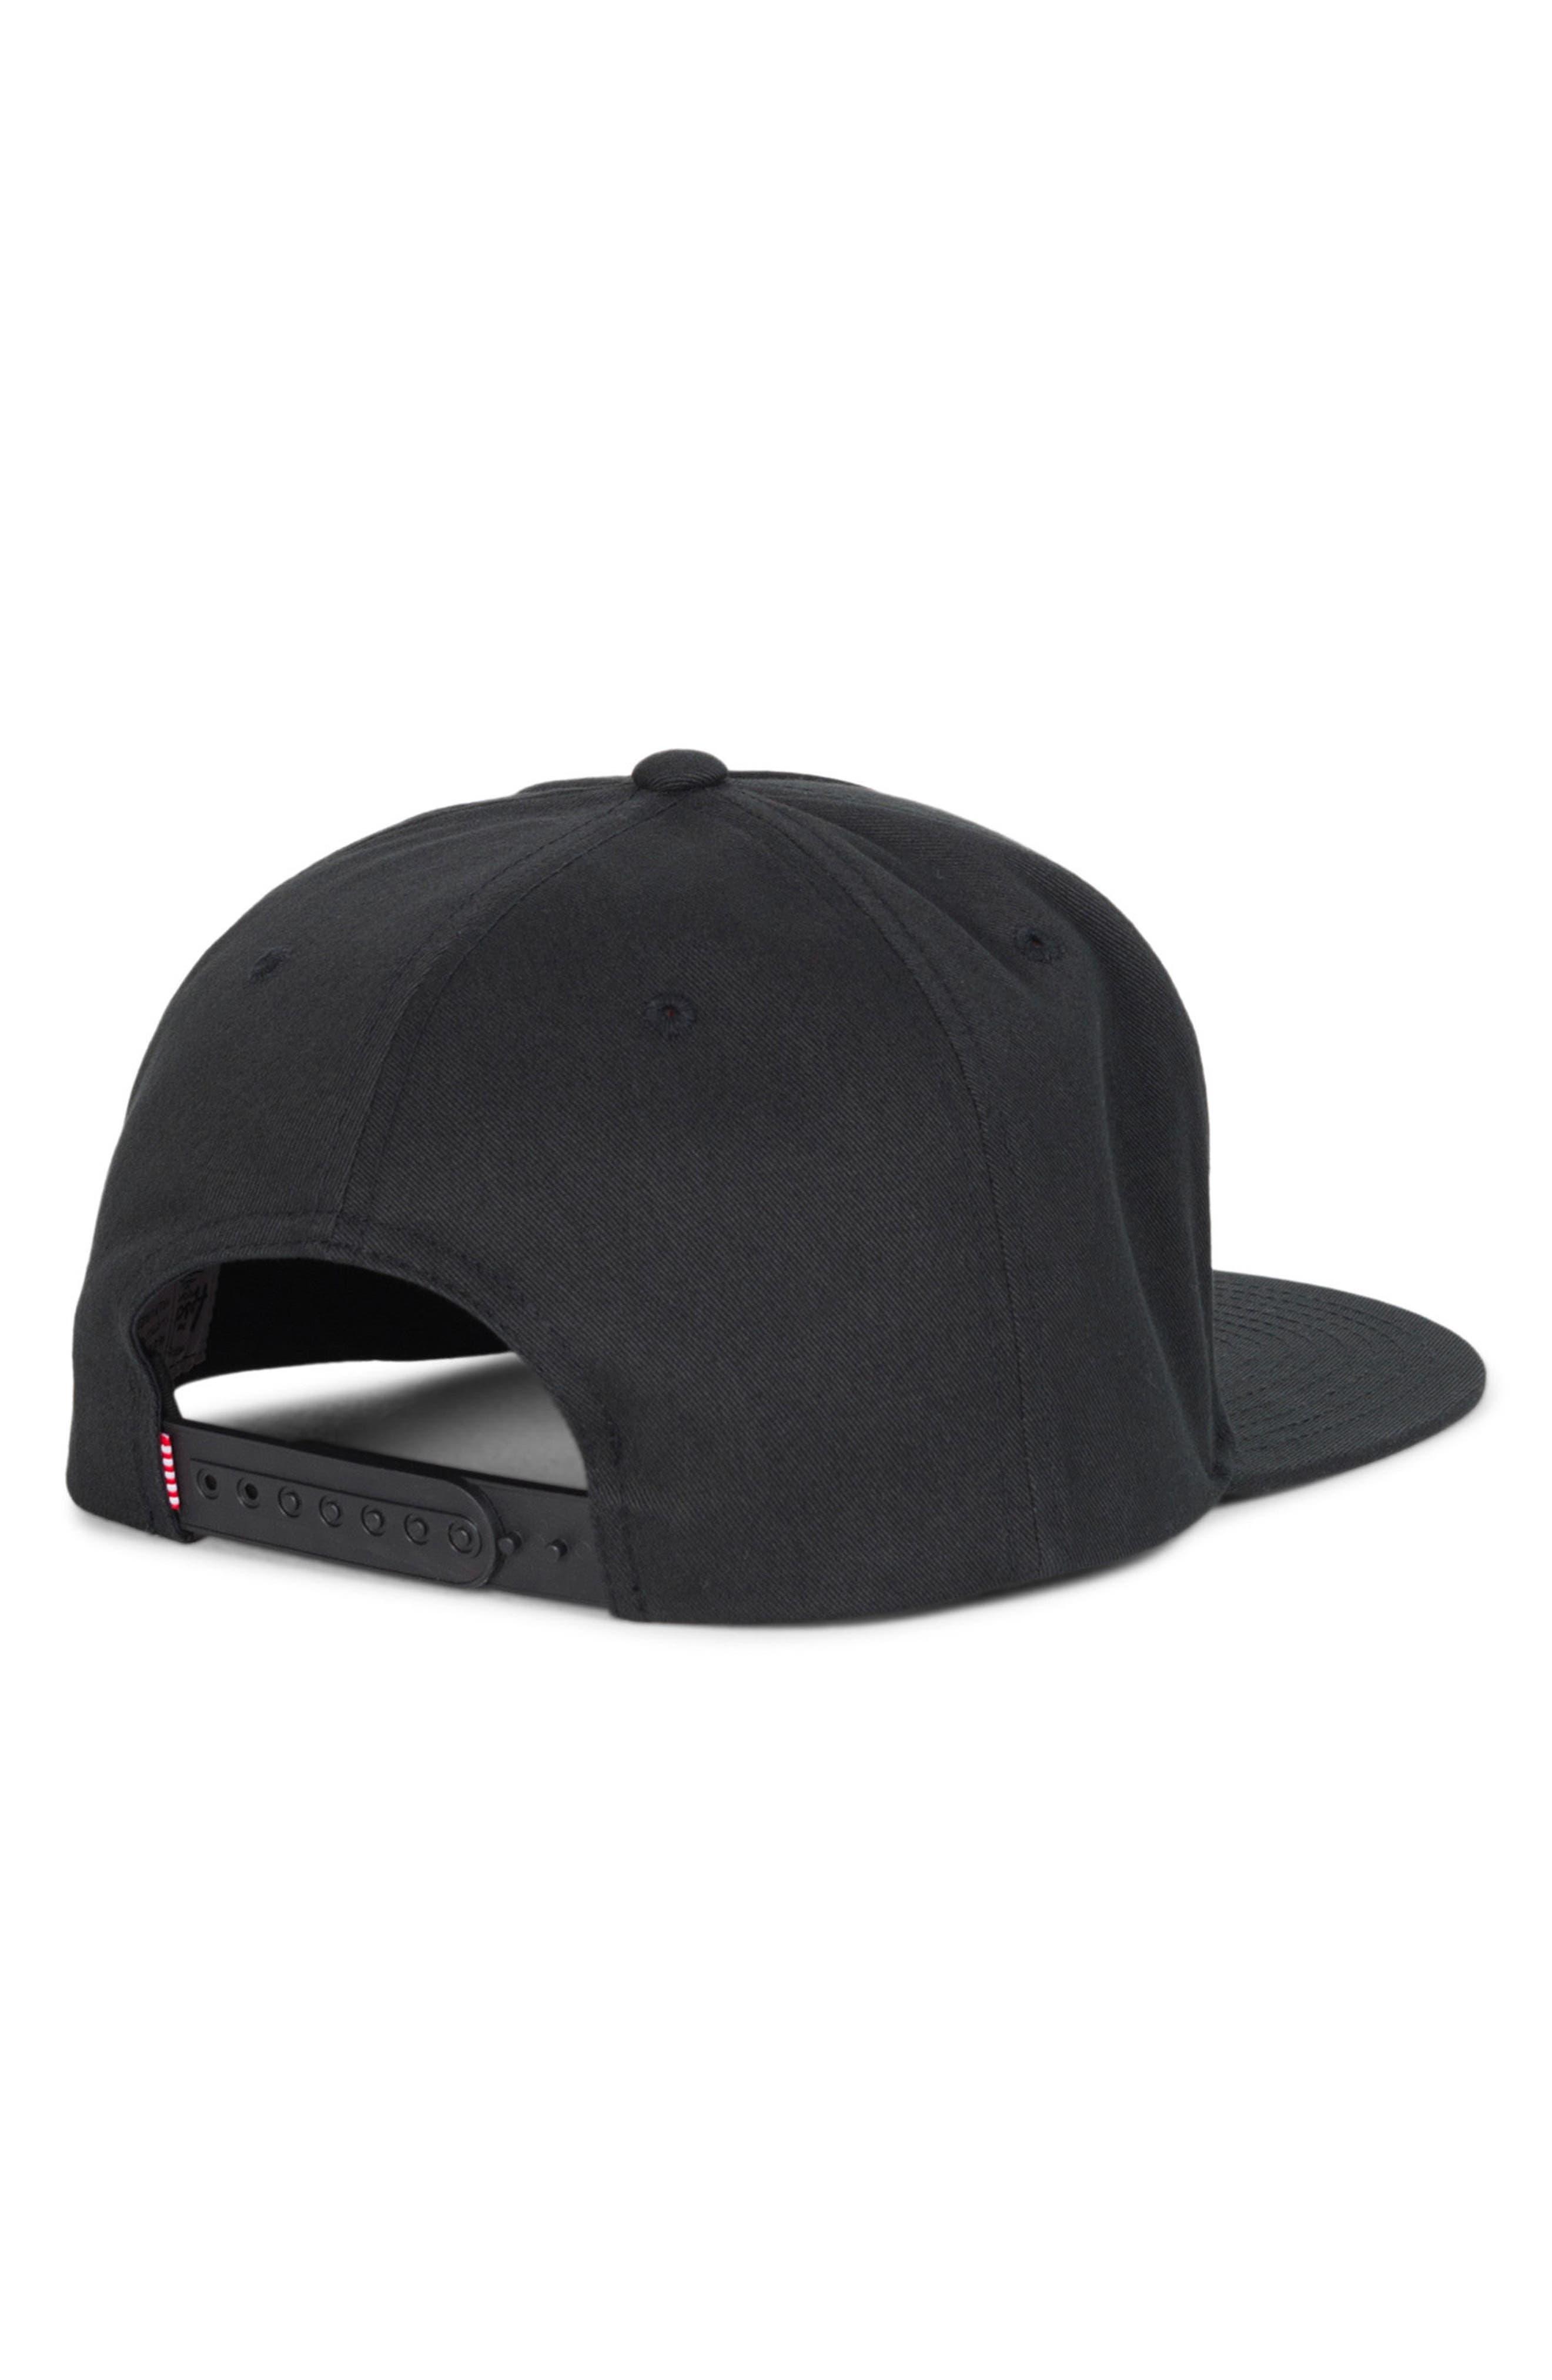 Trademark Snapback Baseball Cap,                             Alternate thumbnail 2, color,                             001